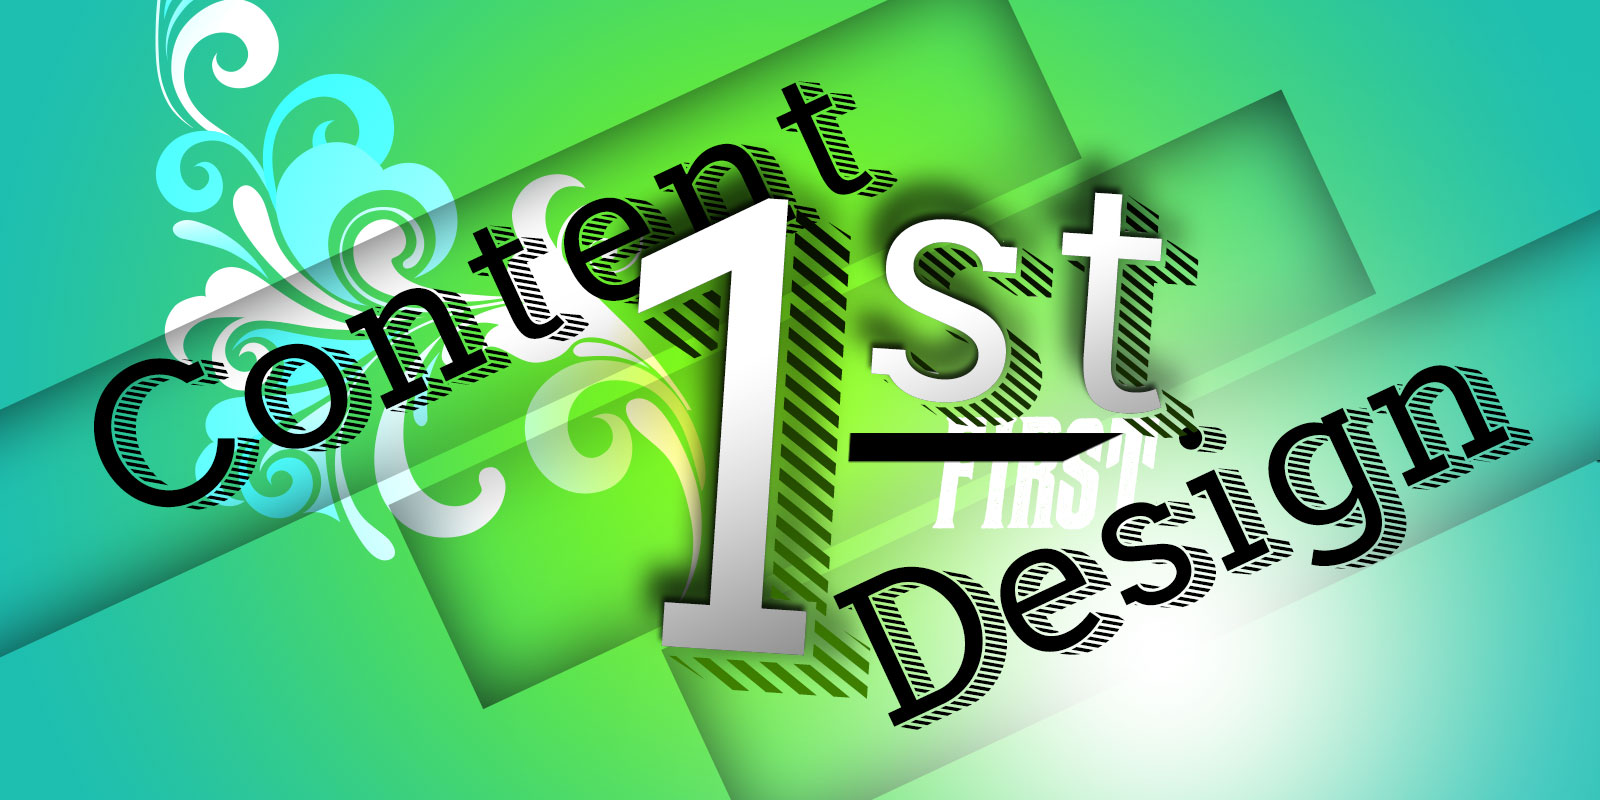 Content First Design